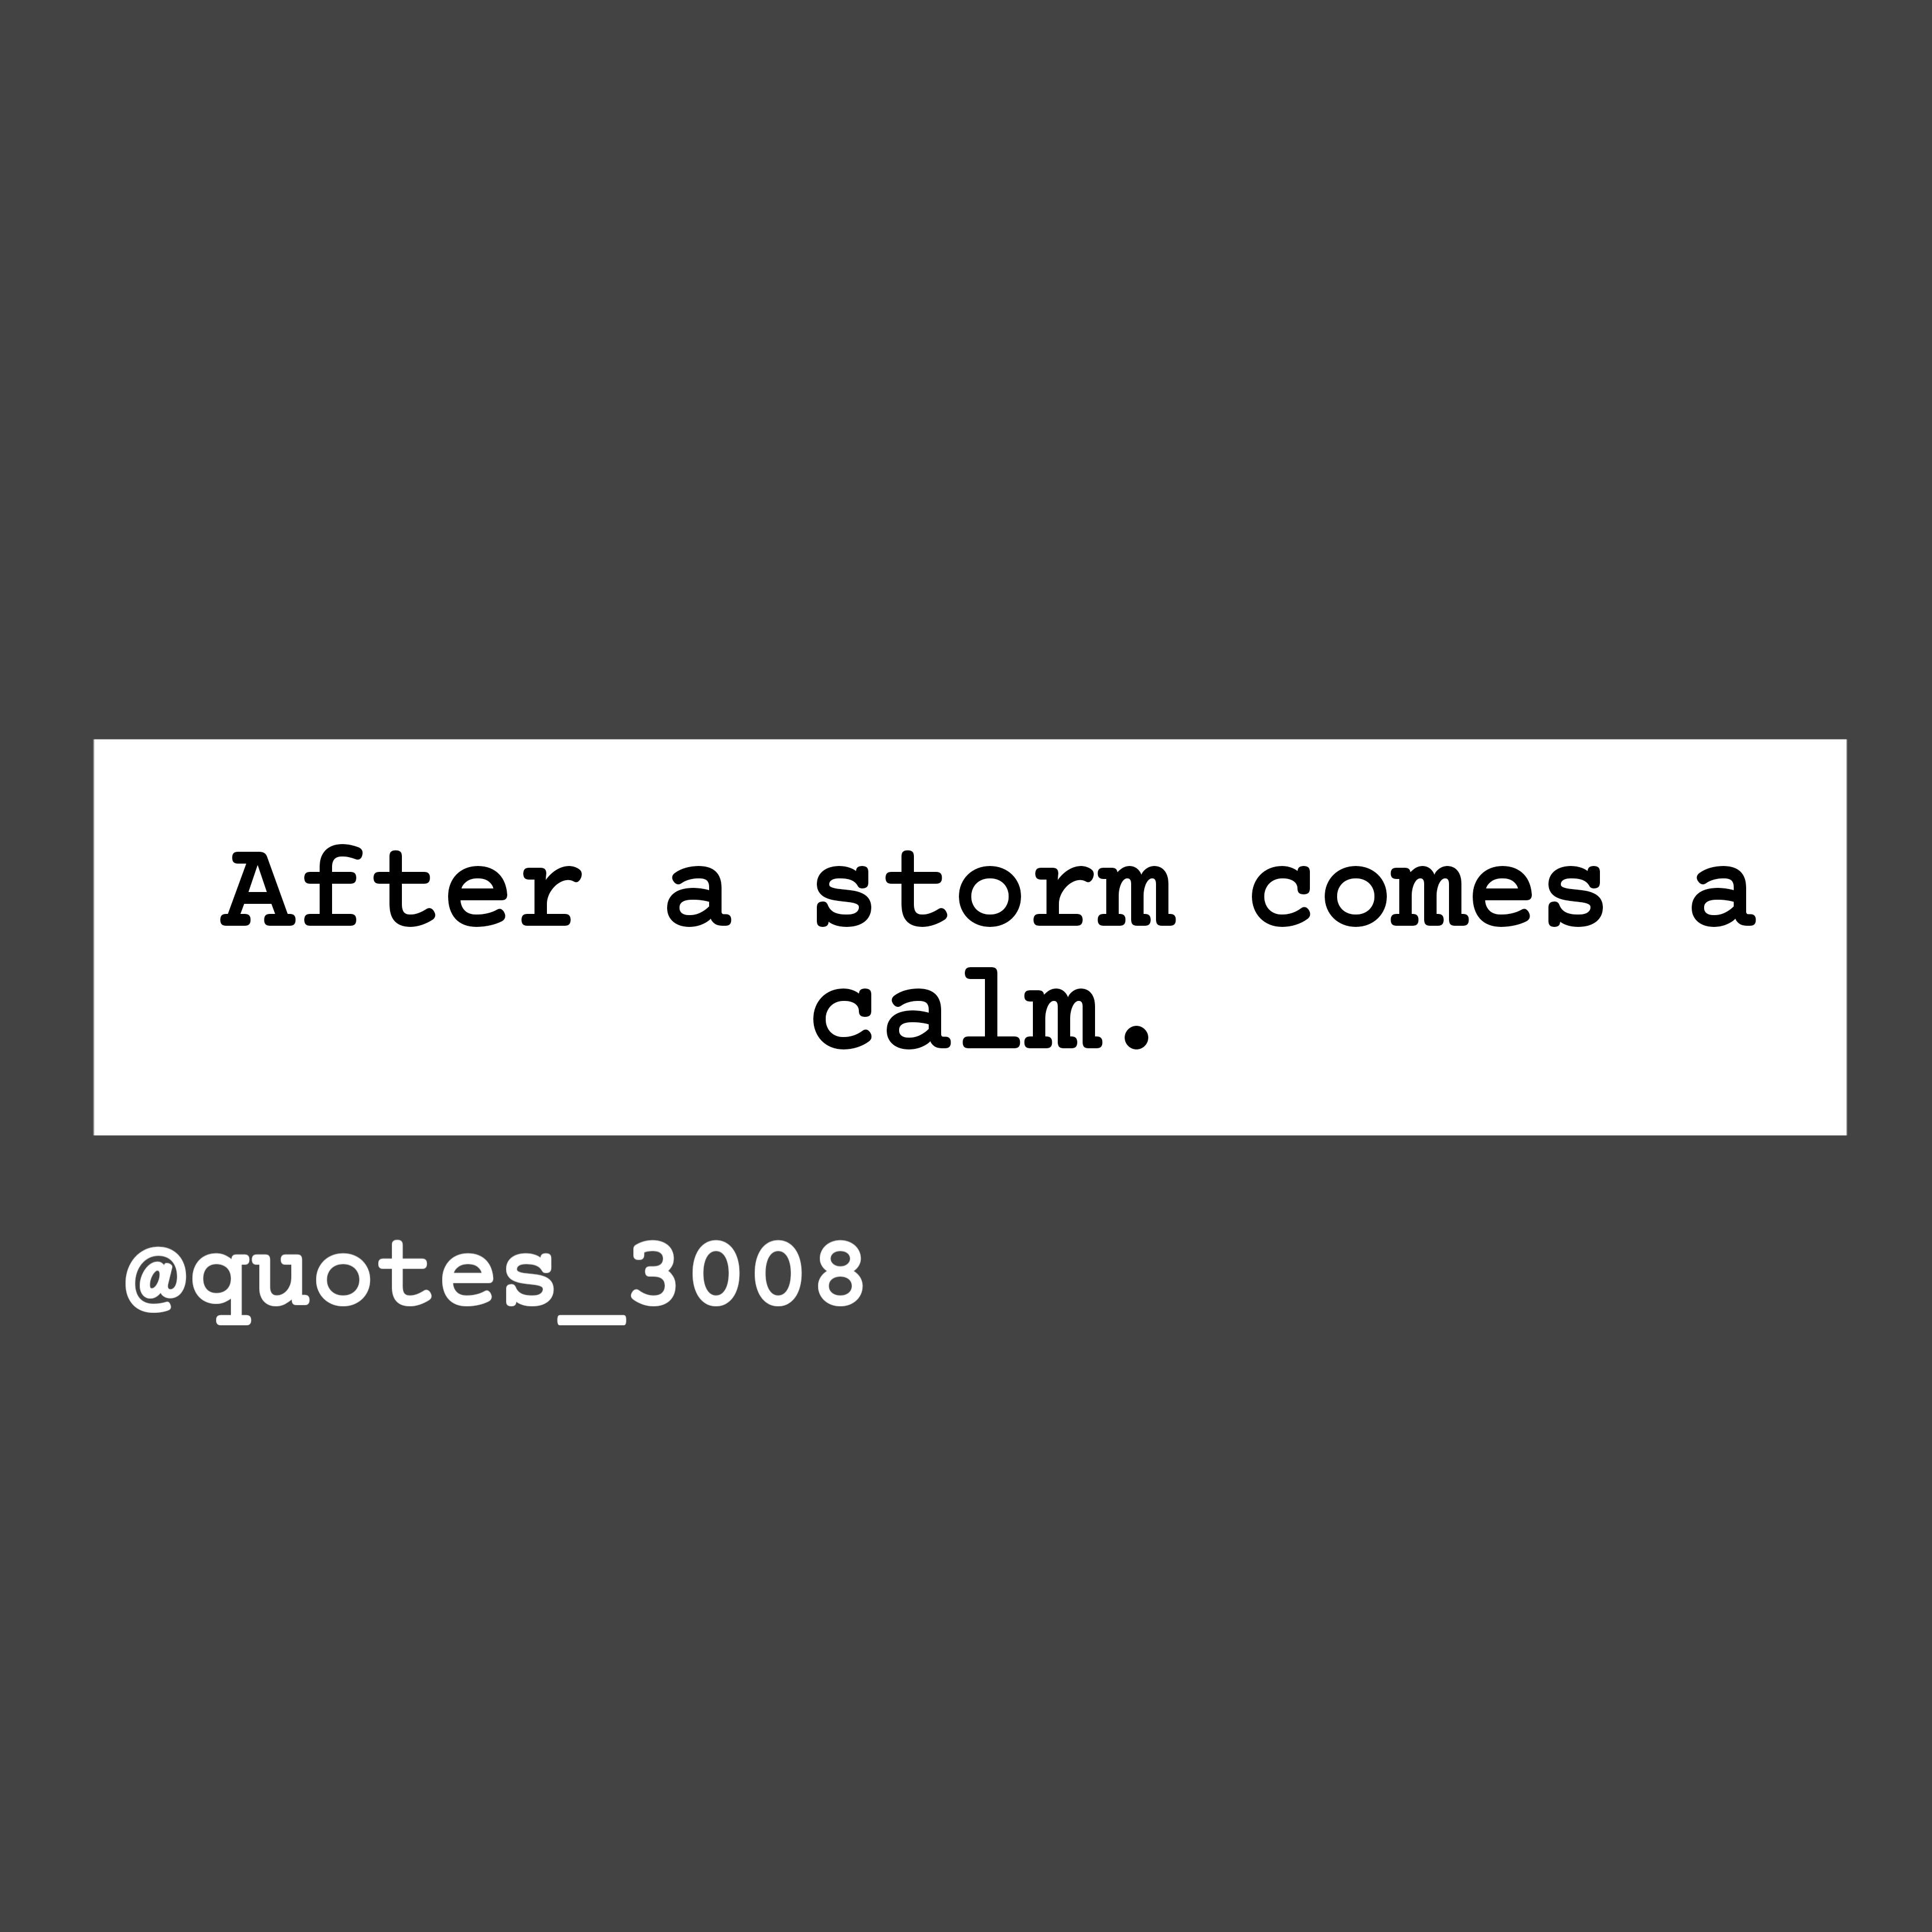 """After a Storm comes a Calm."" (1280×1280)"